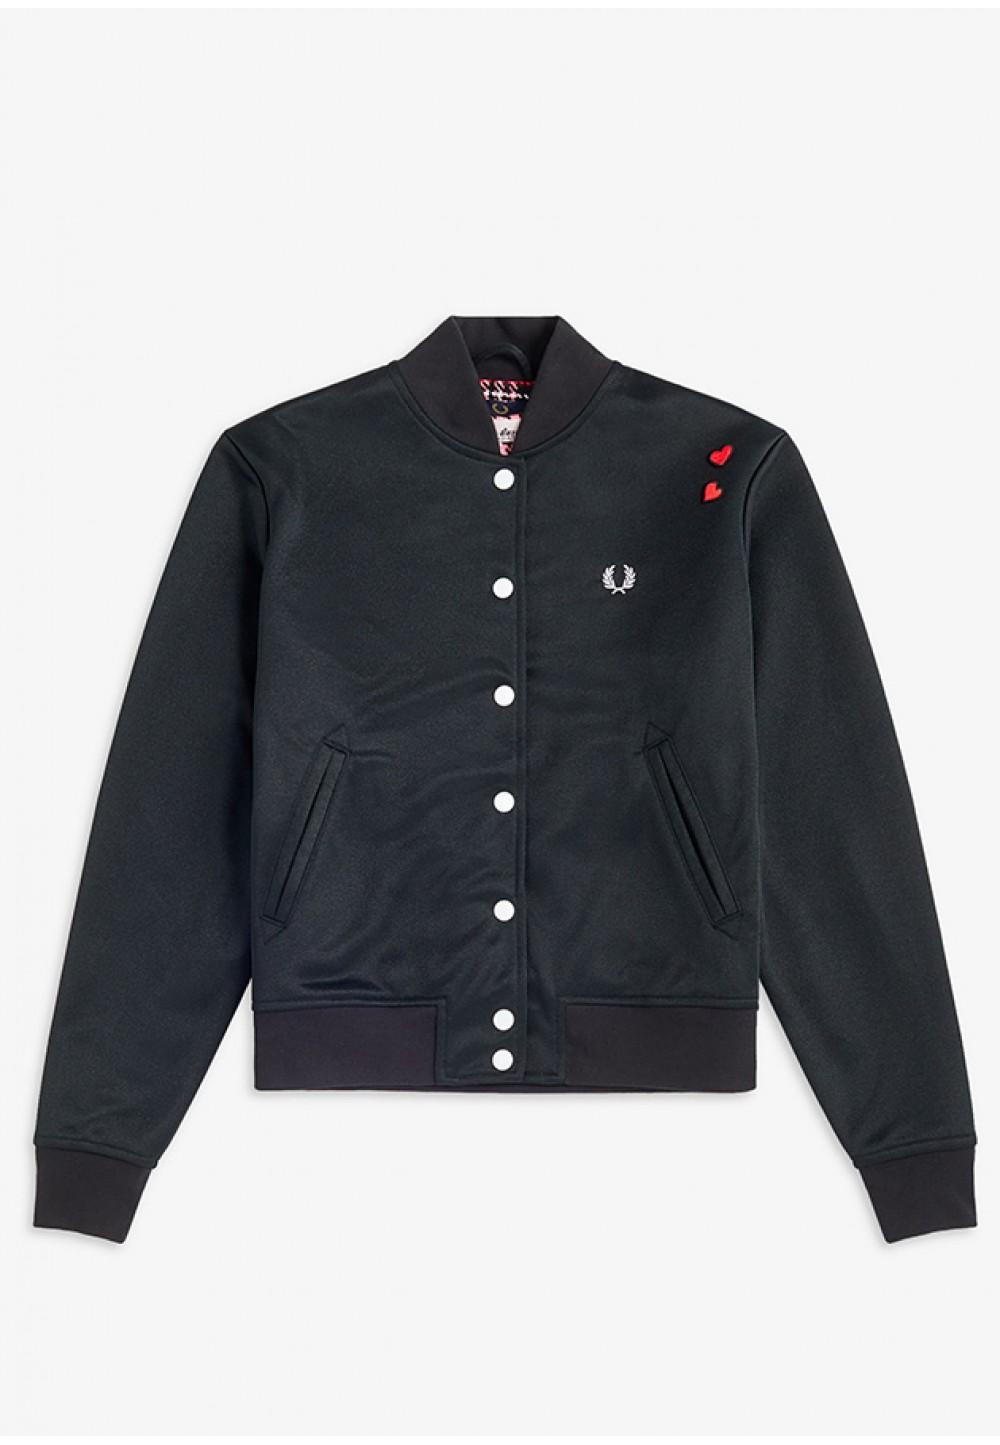 Женская куртка-бомбер с логотипом на спине